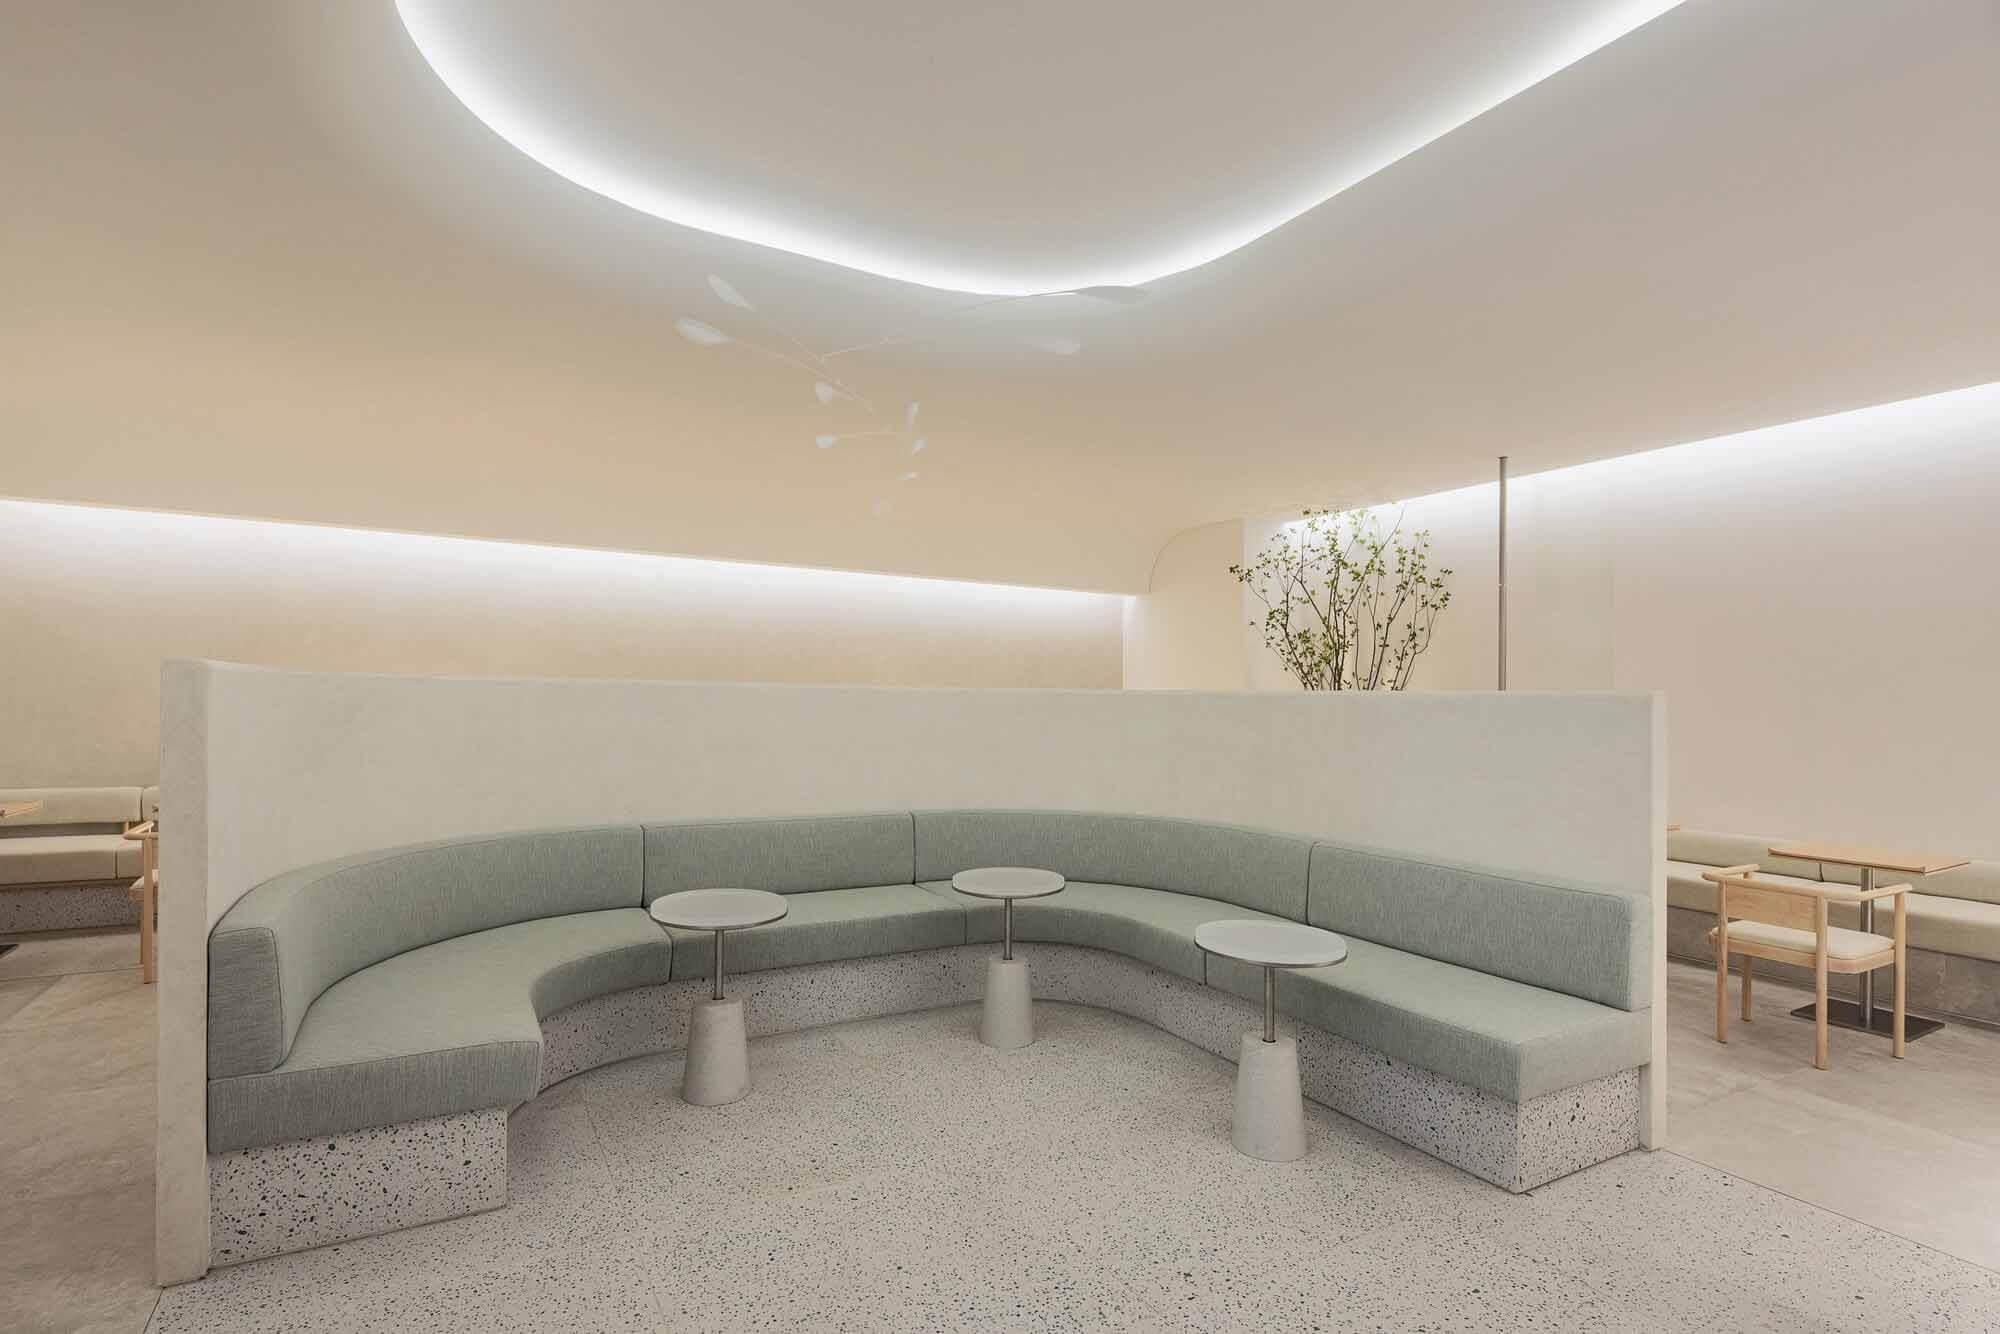 Mok-dong Hyundai SAGE Lounge / ЛАБОРАТОРИЯ